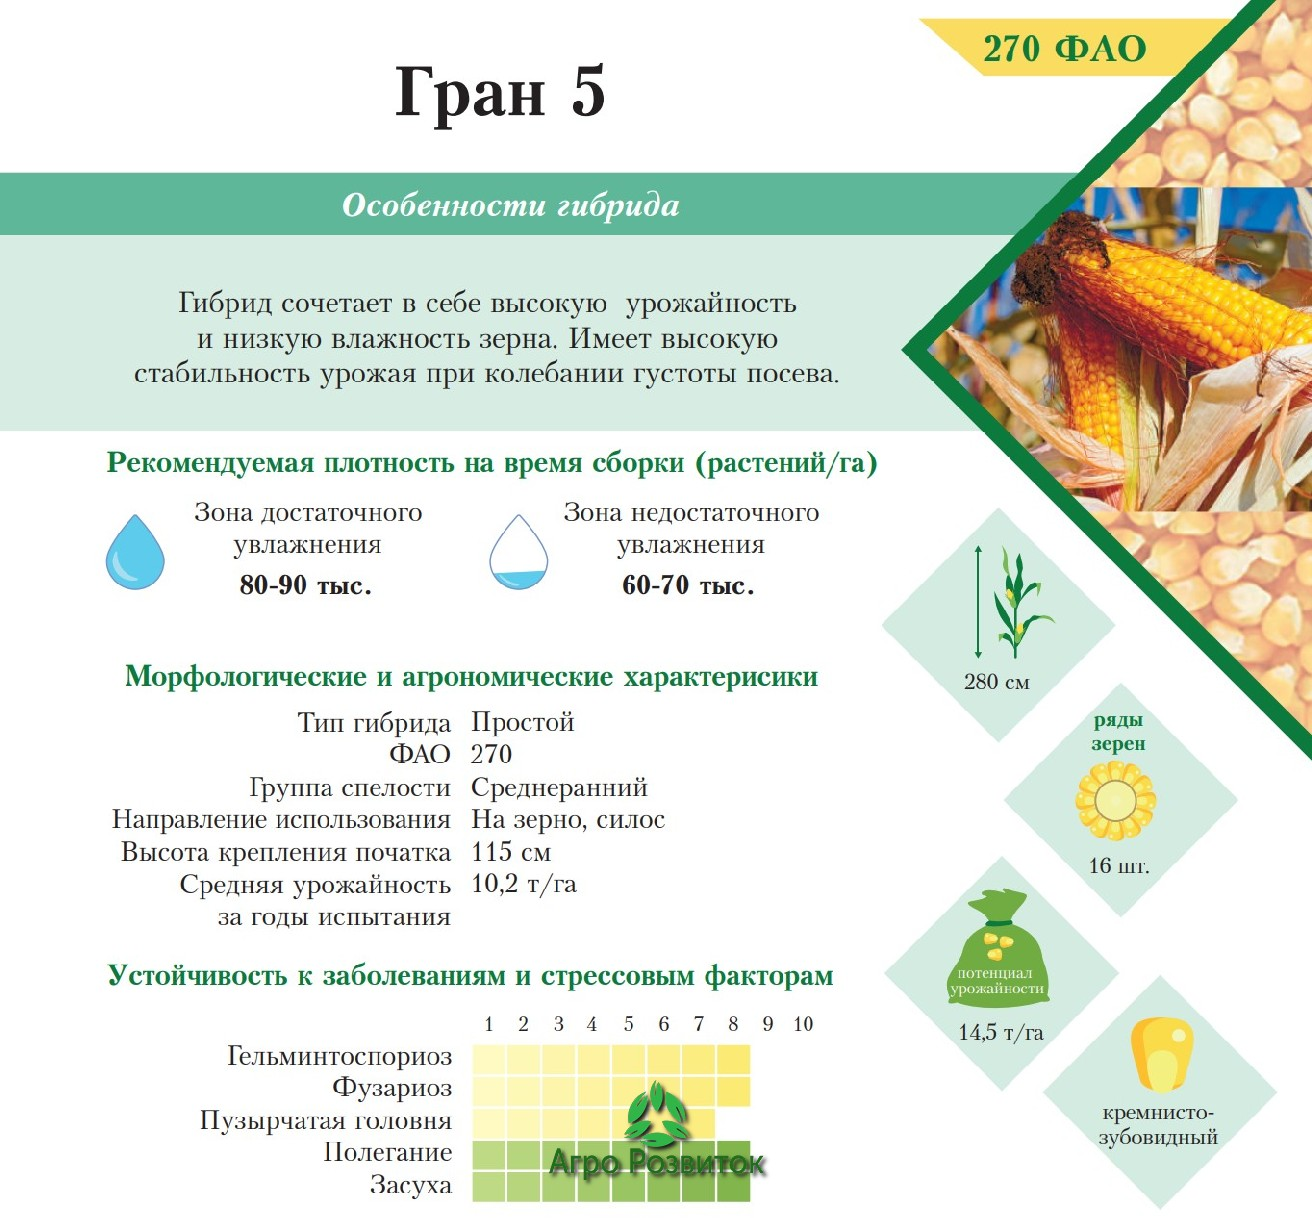 Кукуруза Гран 5 - Цена Семян (ФАО 270)